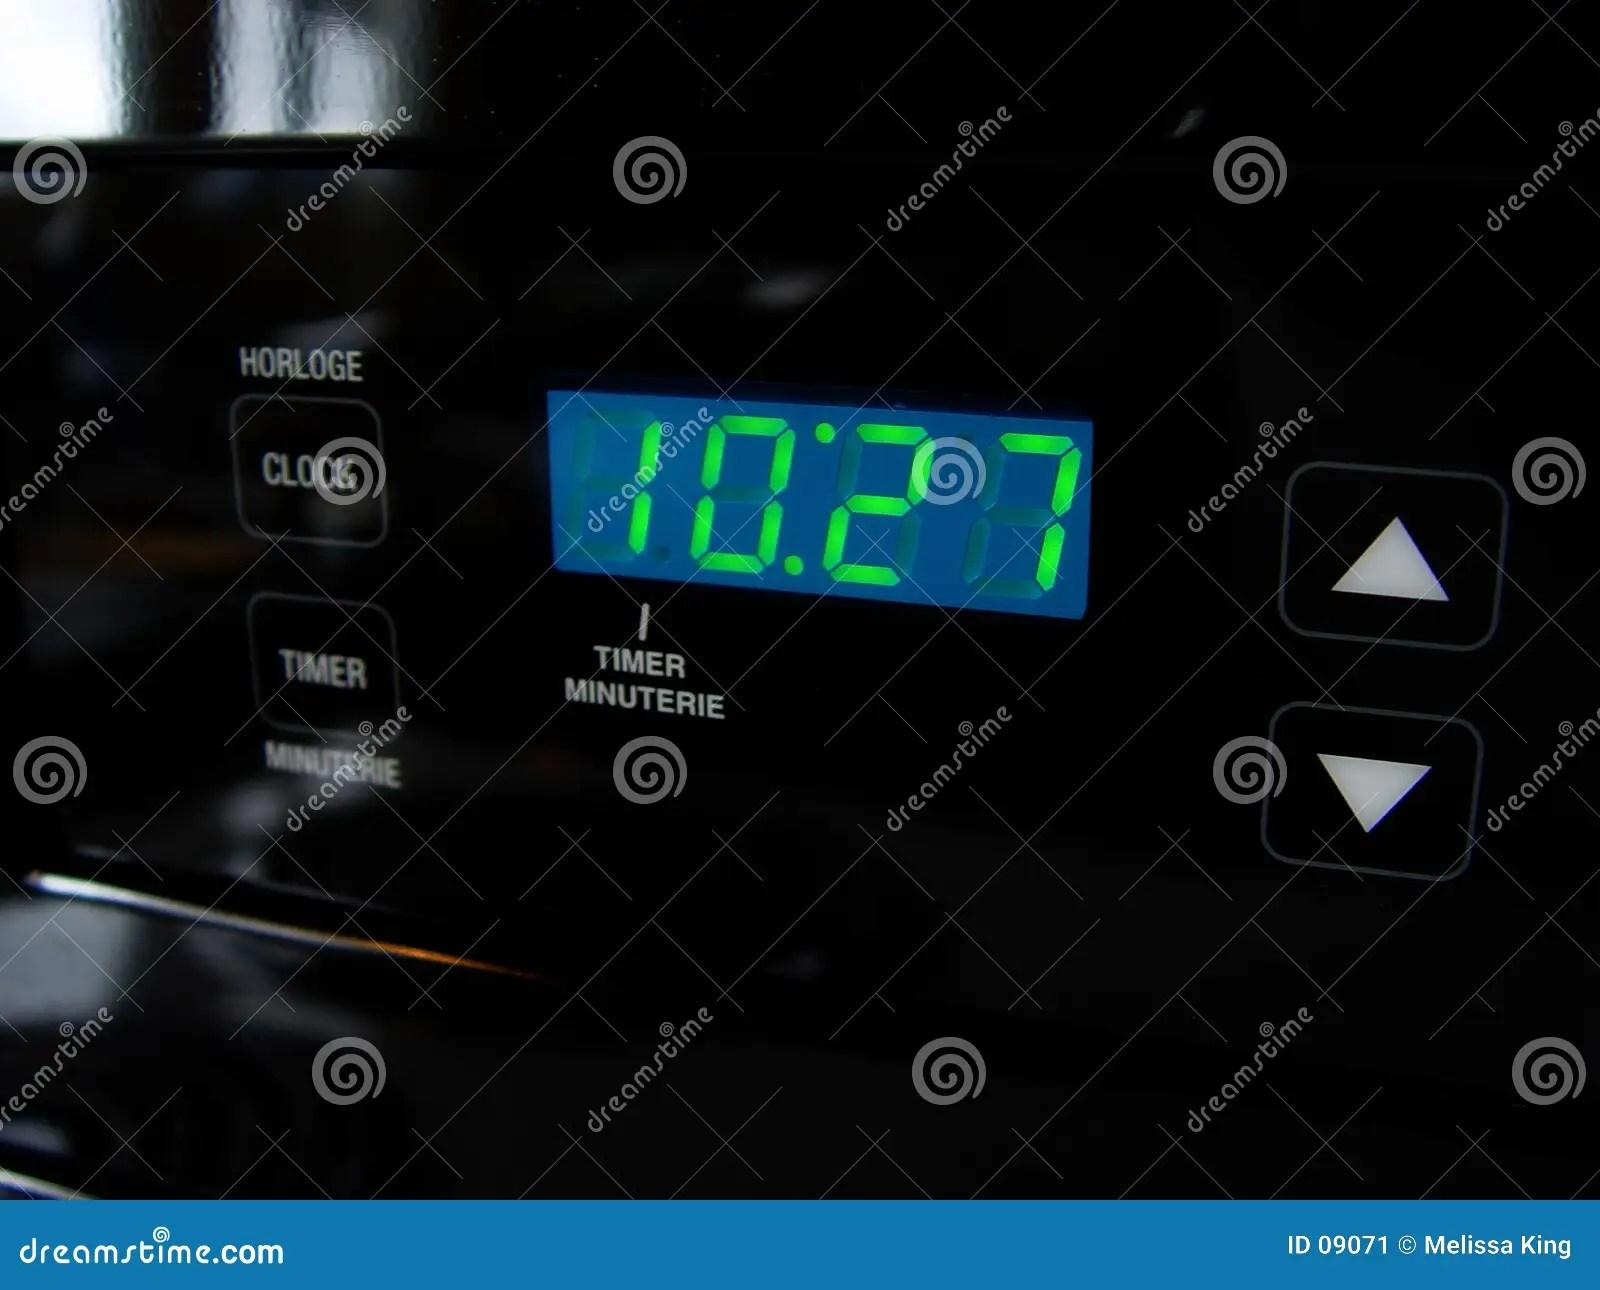 Regular Alarm Clock